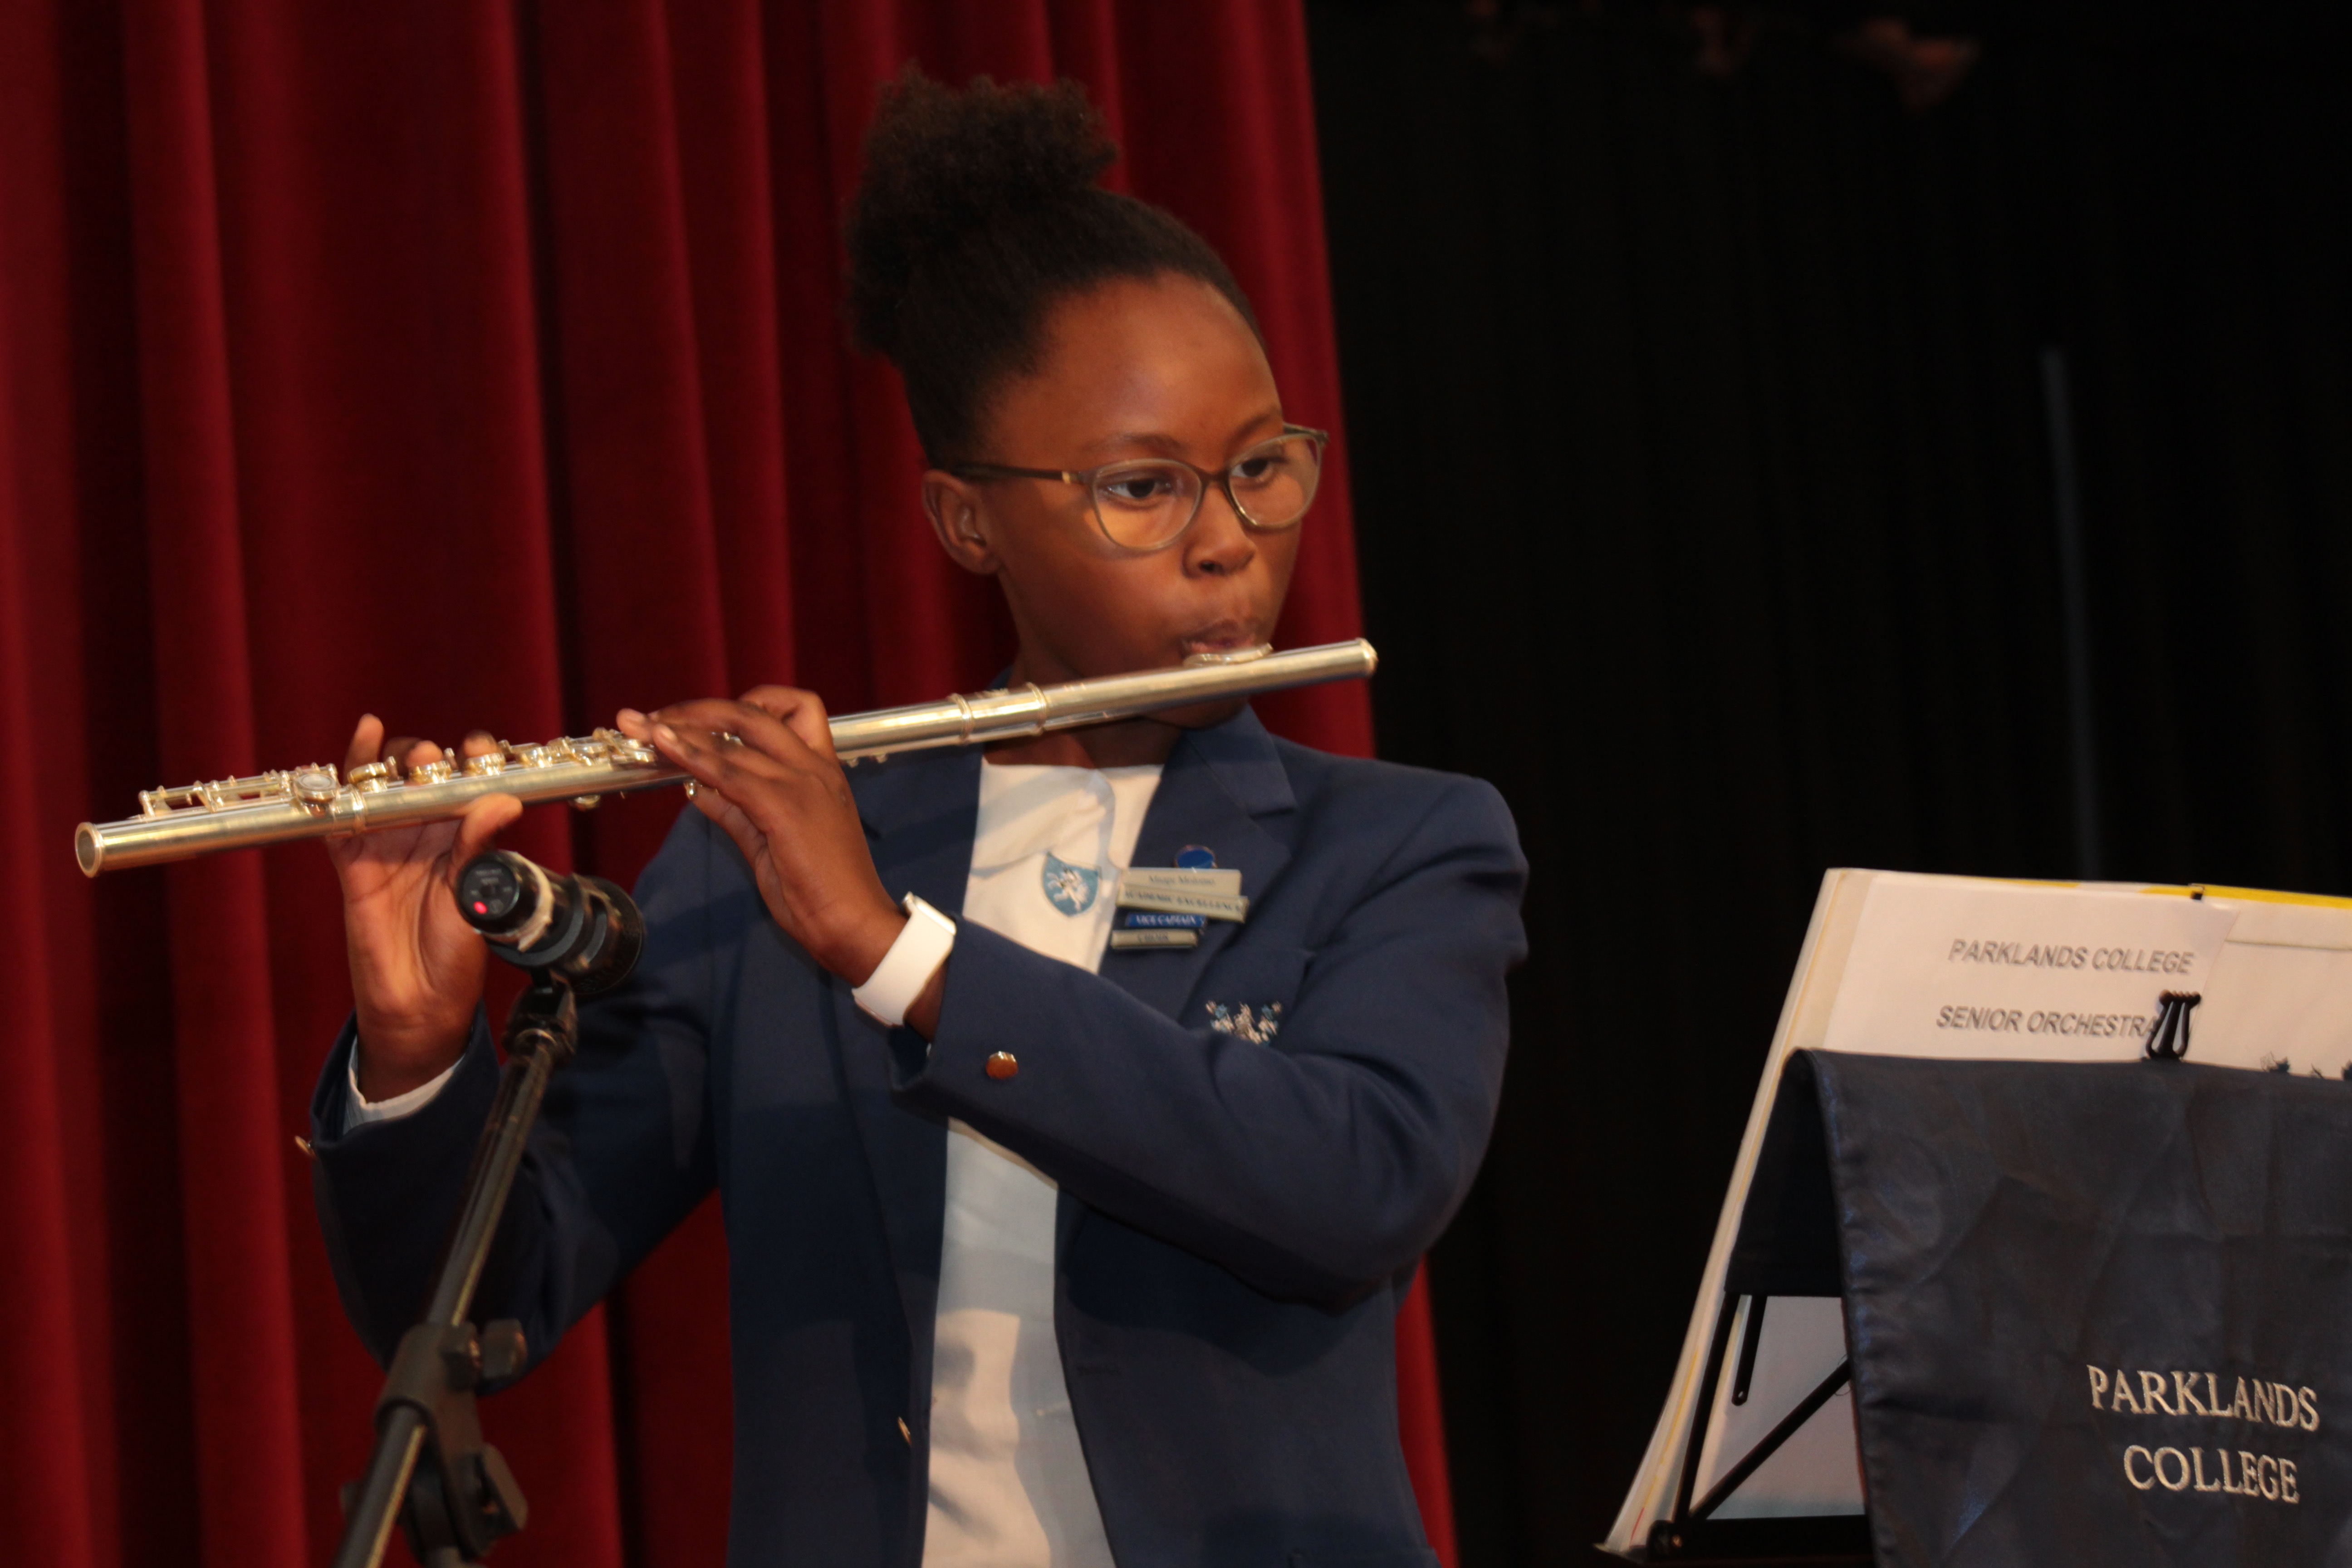 Parklands College Senior Preparatory Flute 2